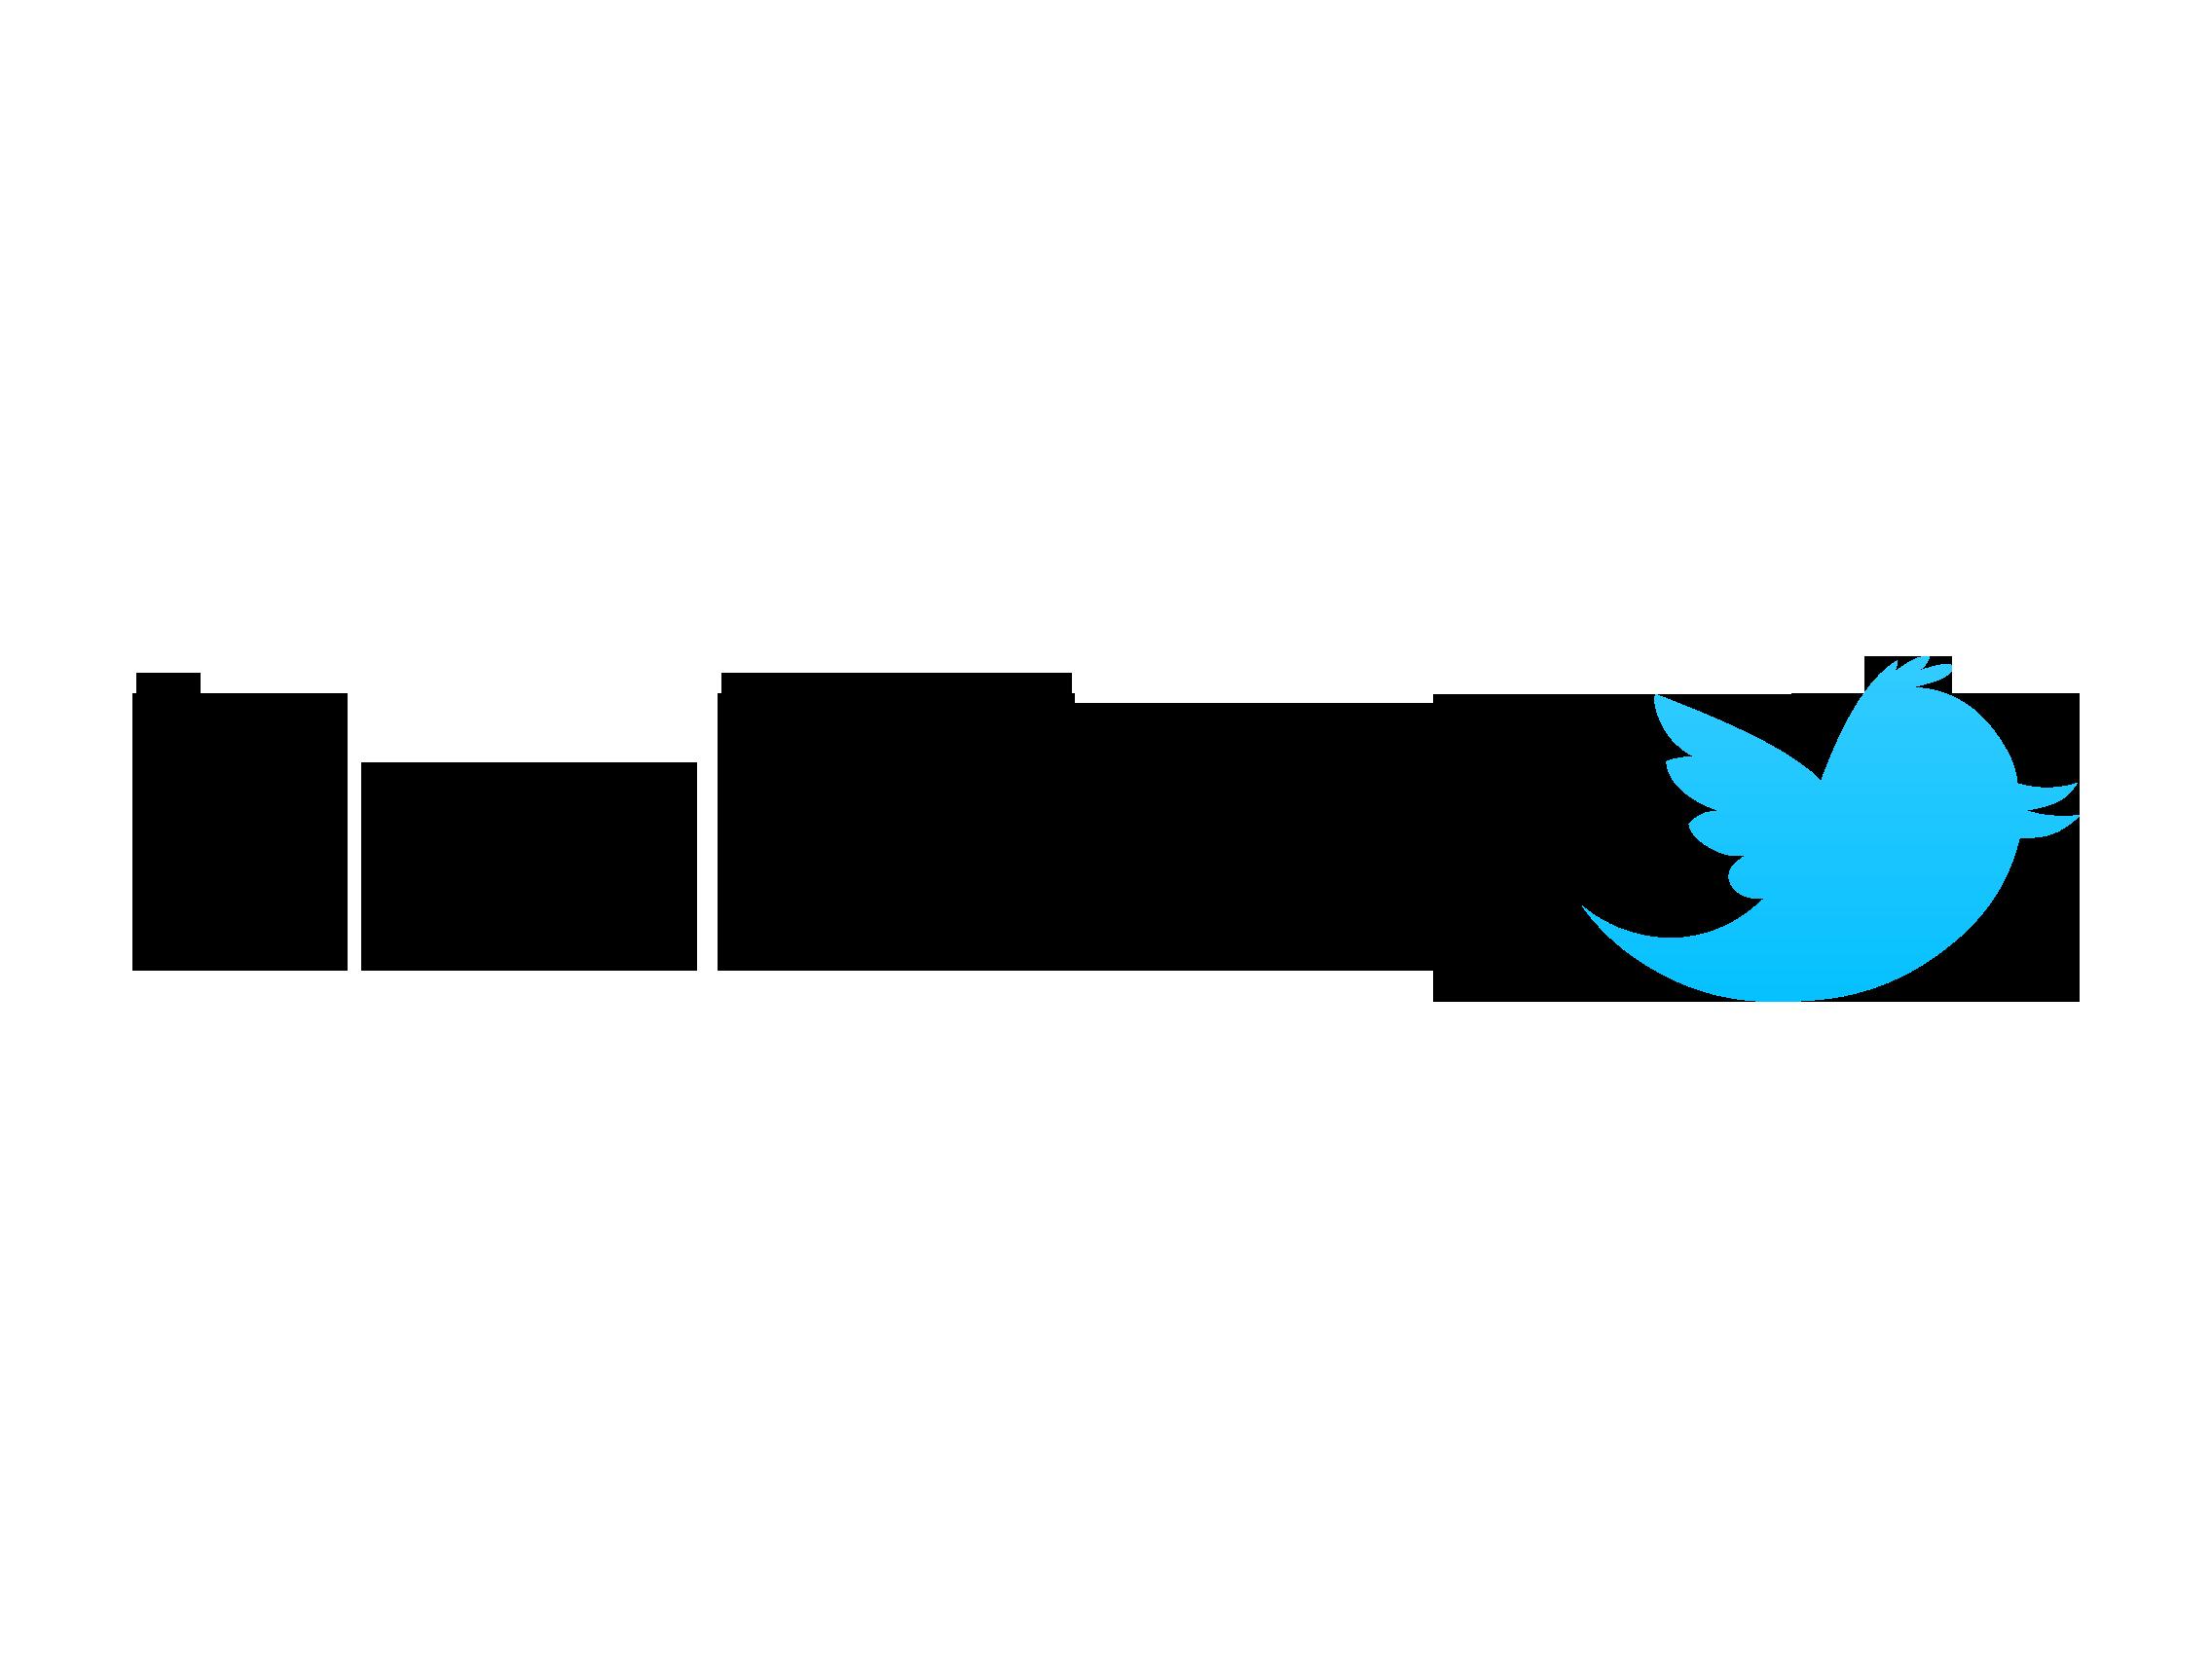 папин сайт в твиттер twitter